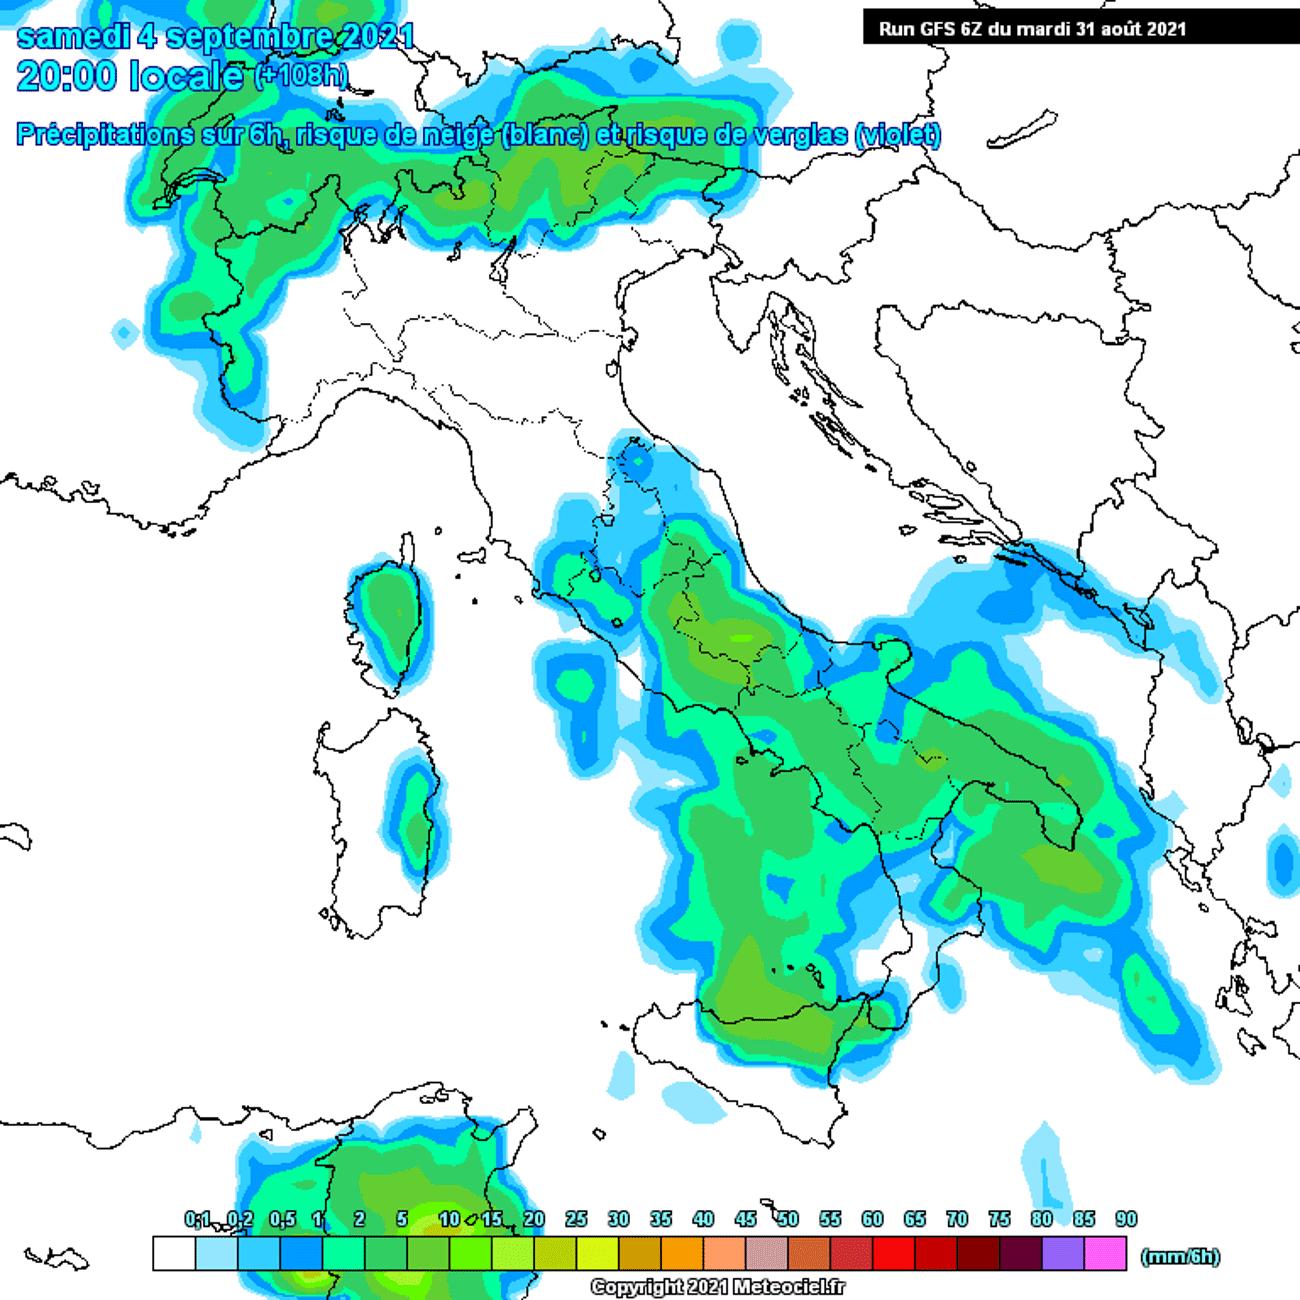 Previsioni meteo italia oggi,domani, weekend